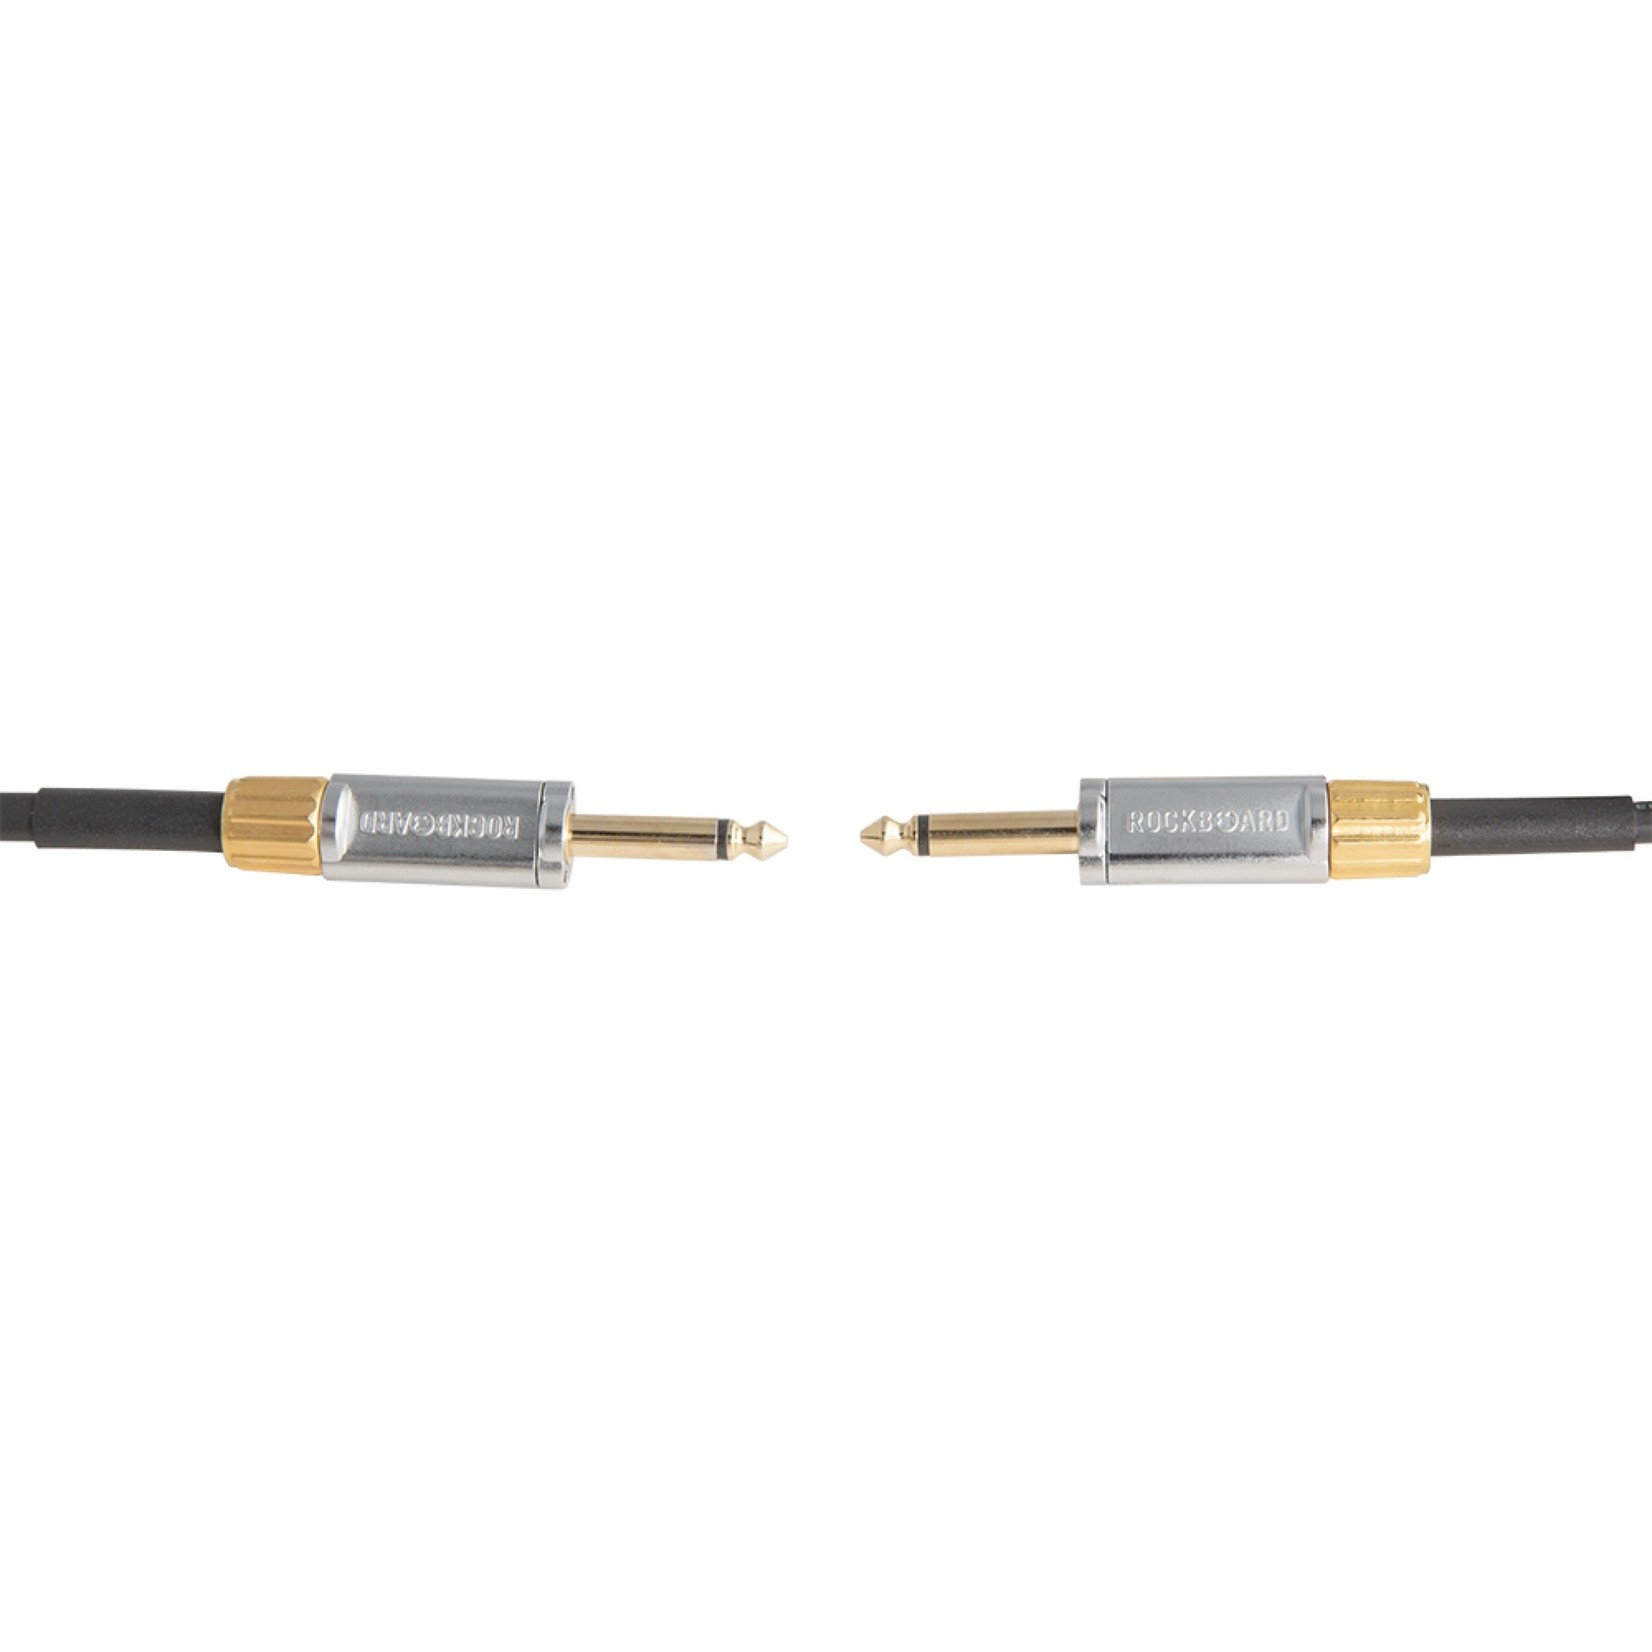 Rockboard RockBoard PREMIUM Flat Instrument Cable, 600 cm / 19.7 ft., straight/straight